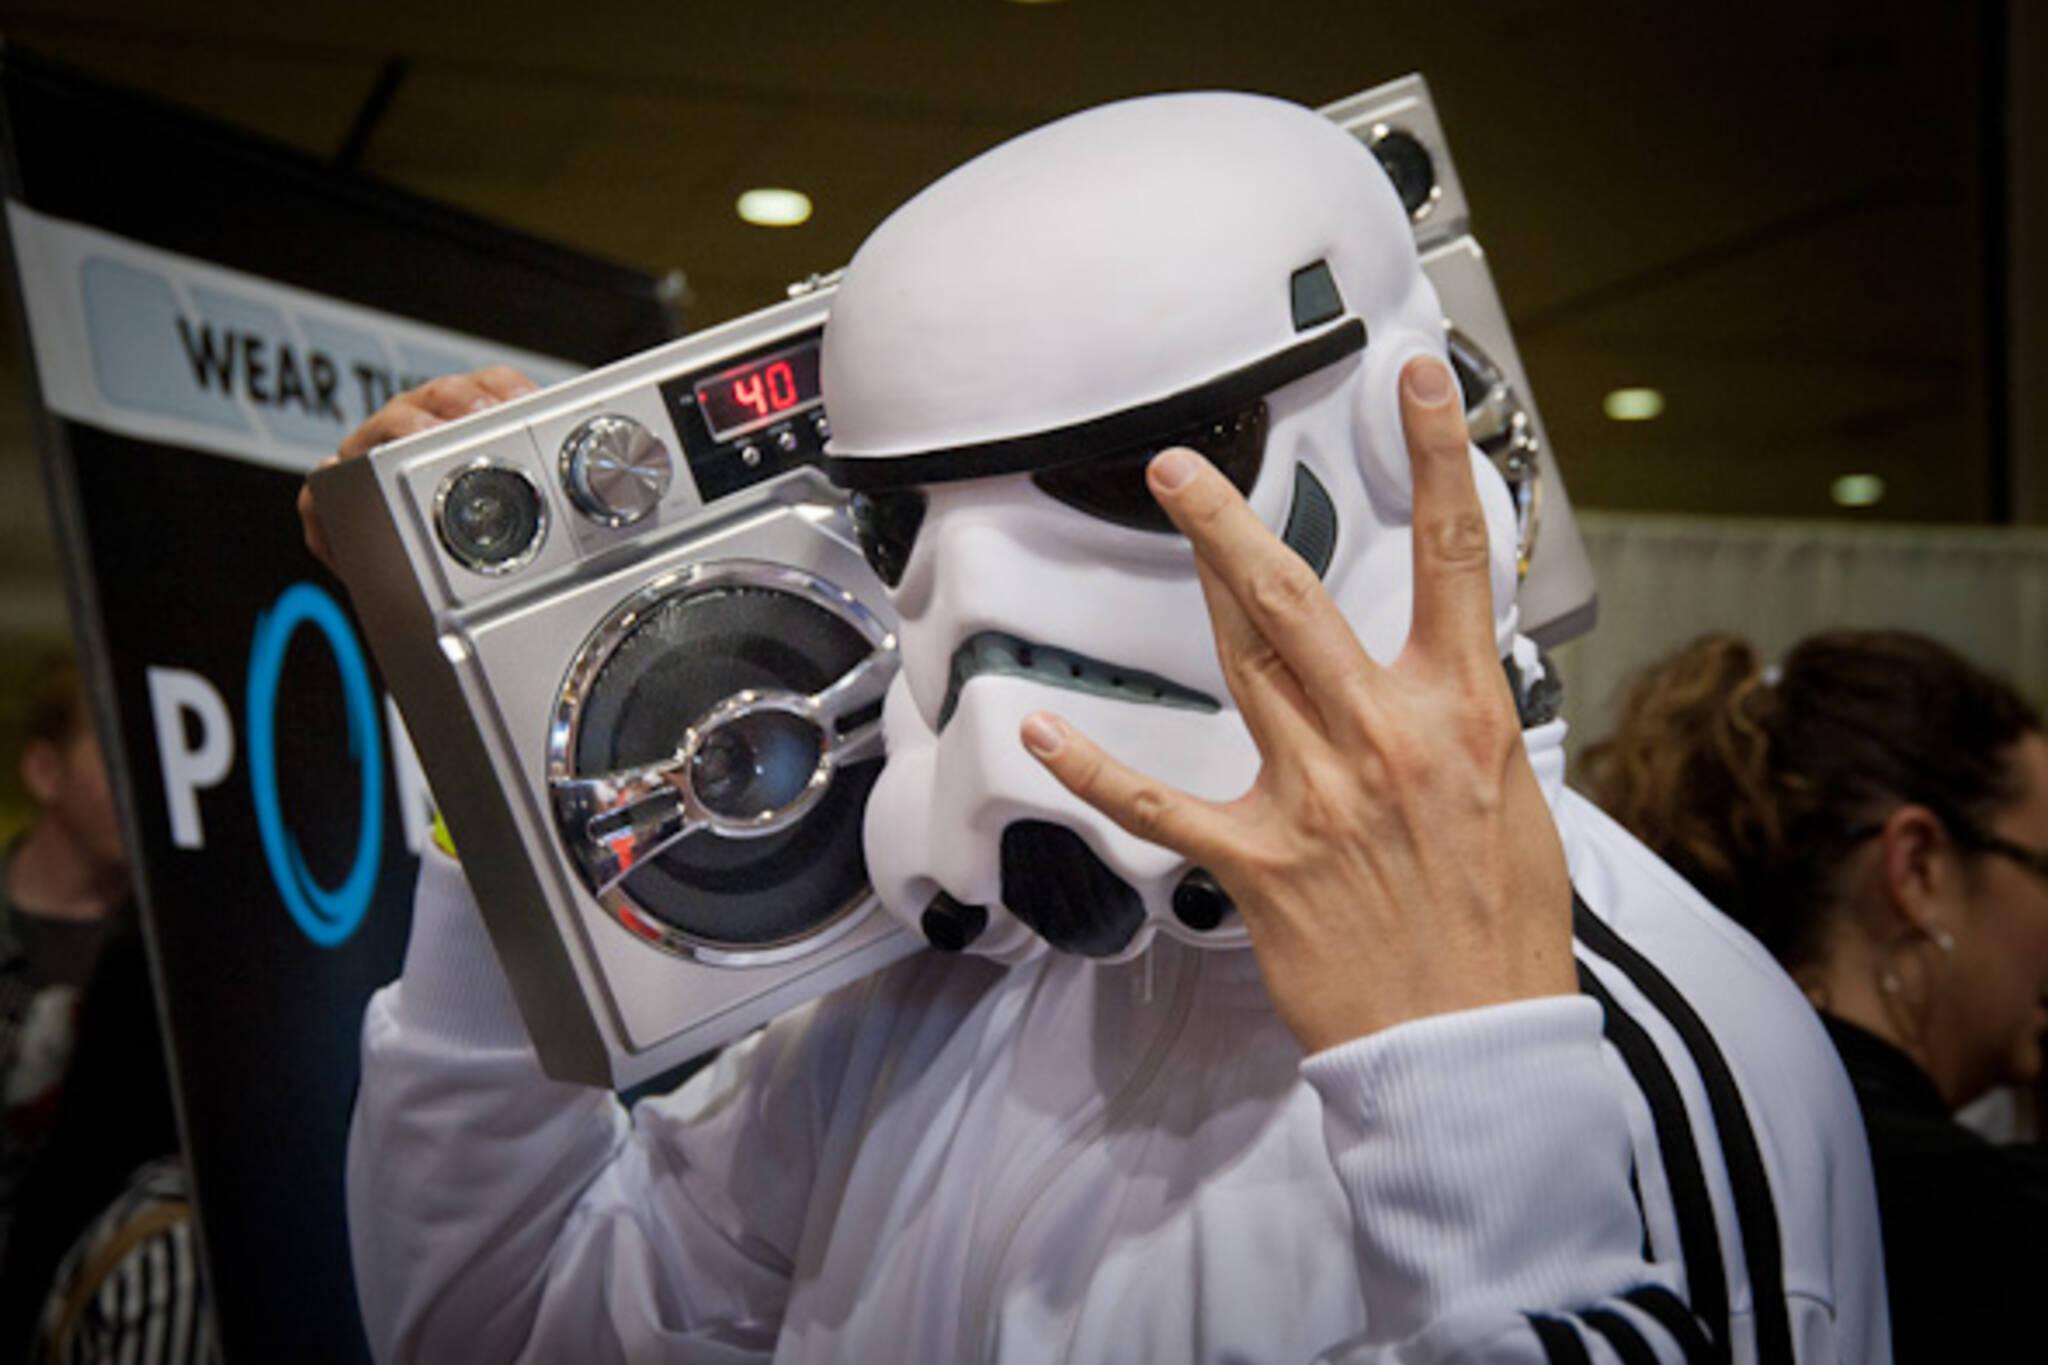 Fan Expo 2011 Toronto